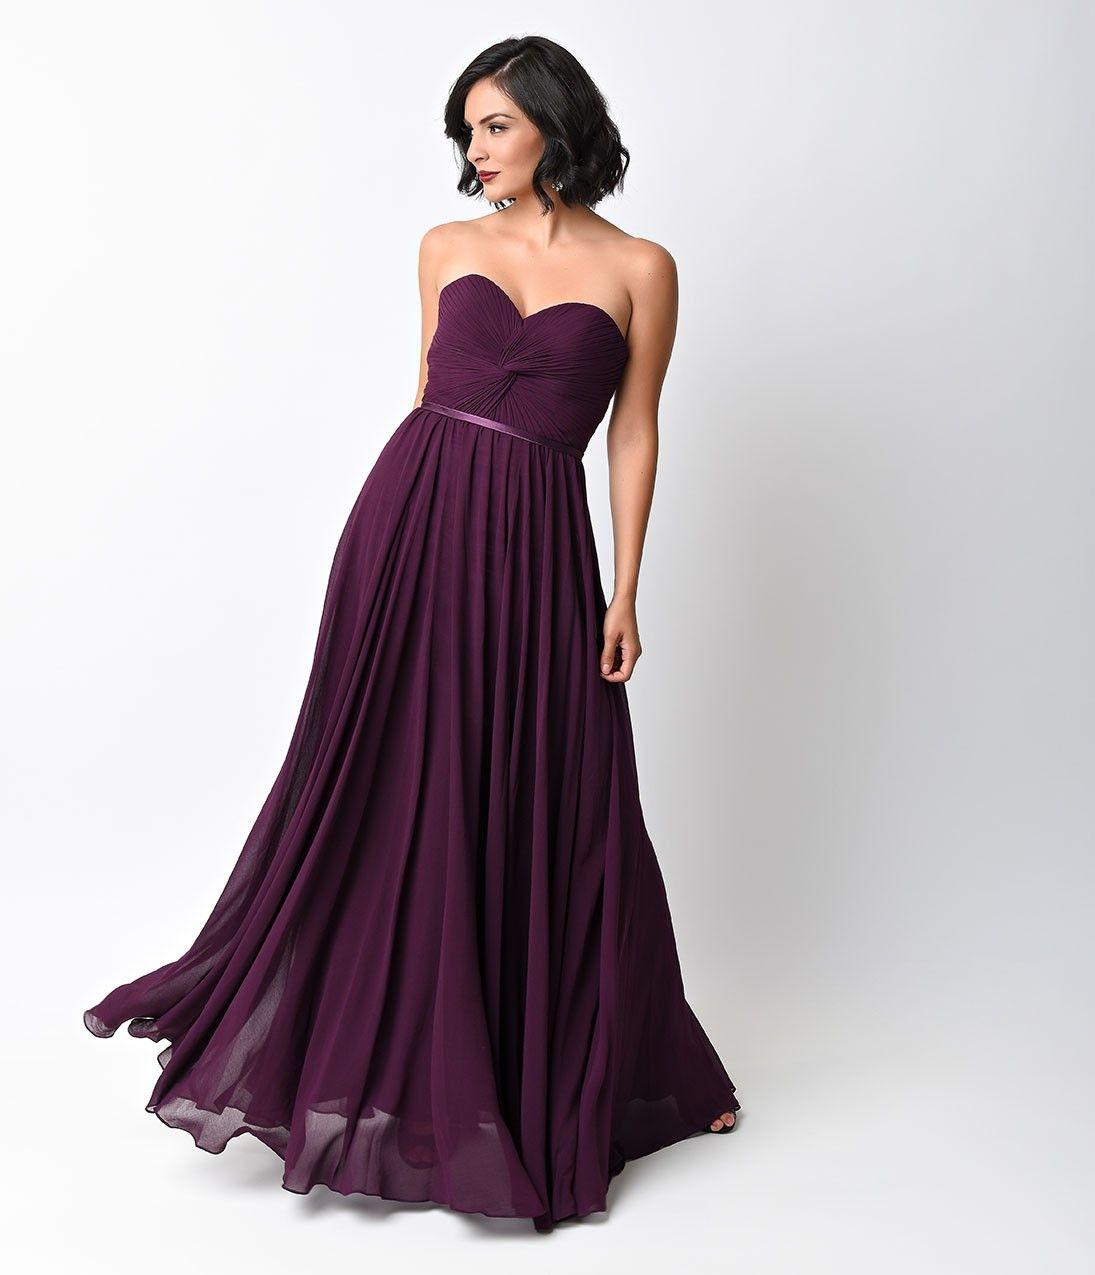 Eggplant Chiffon Strapless Sweetheart Corset Long Gown